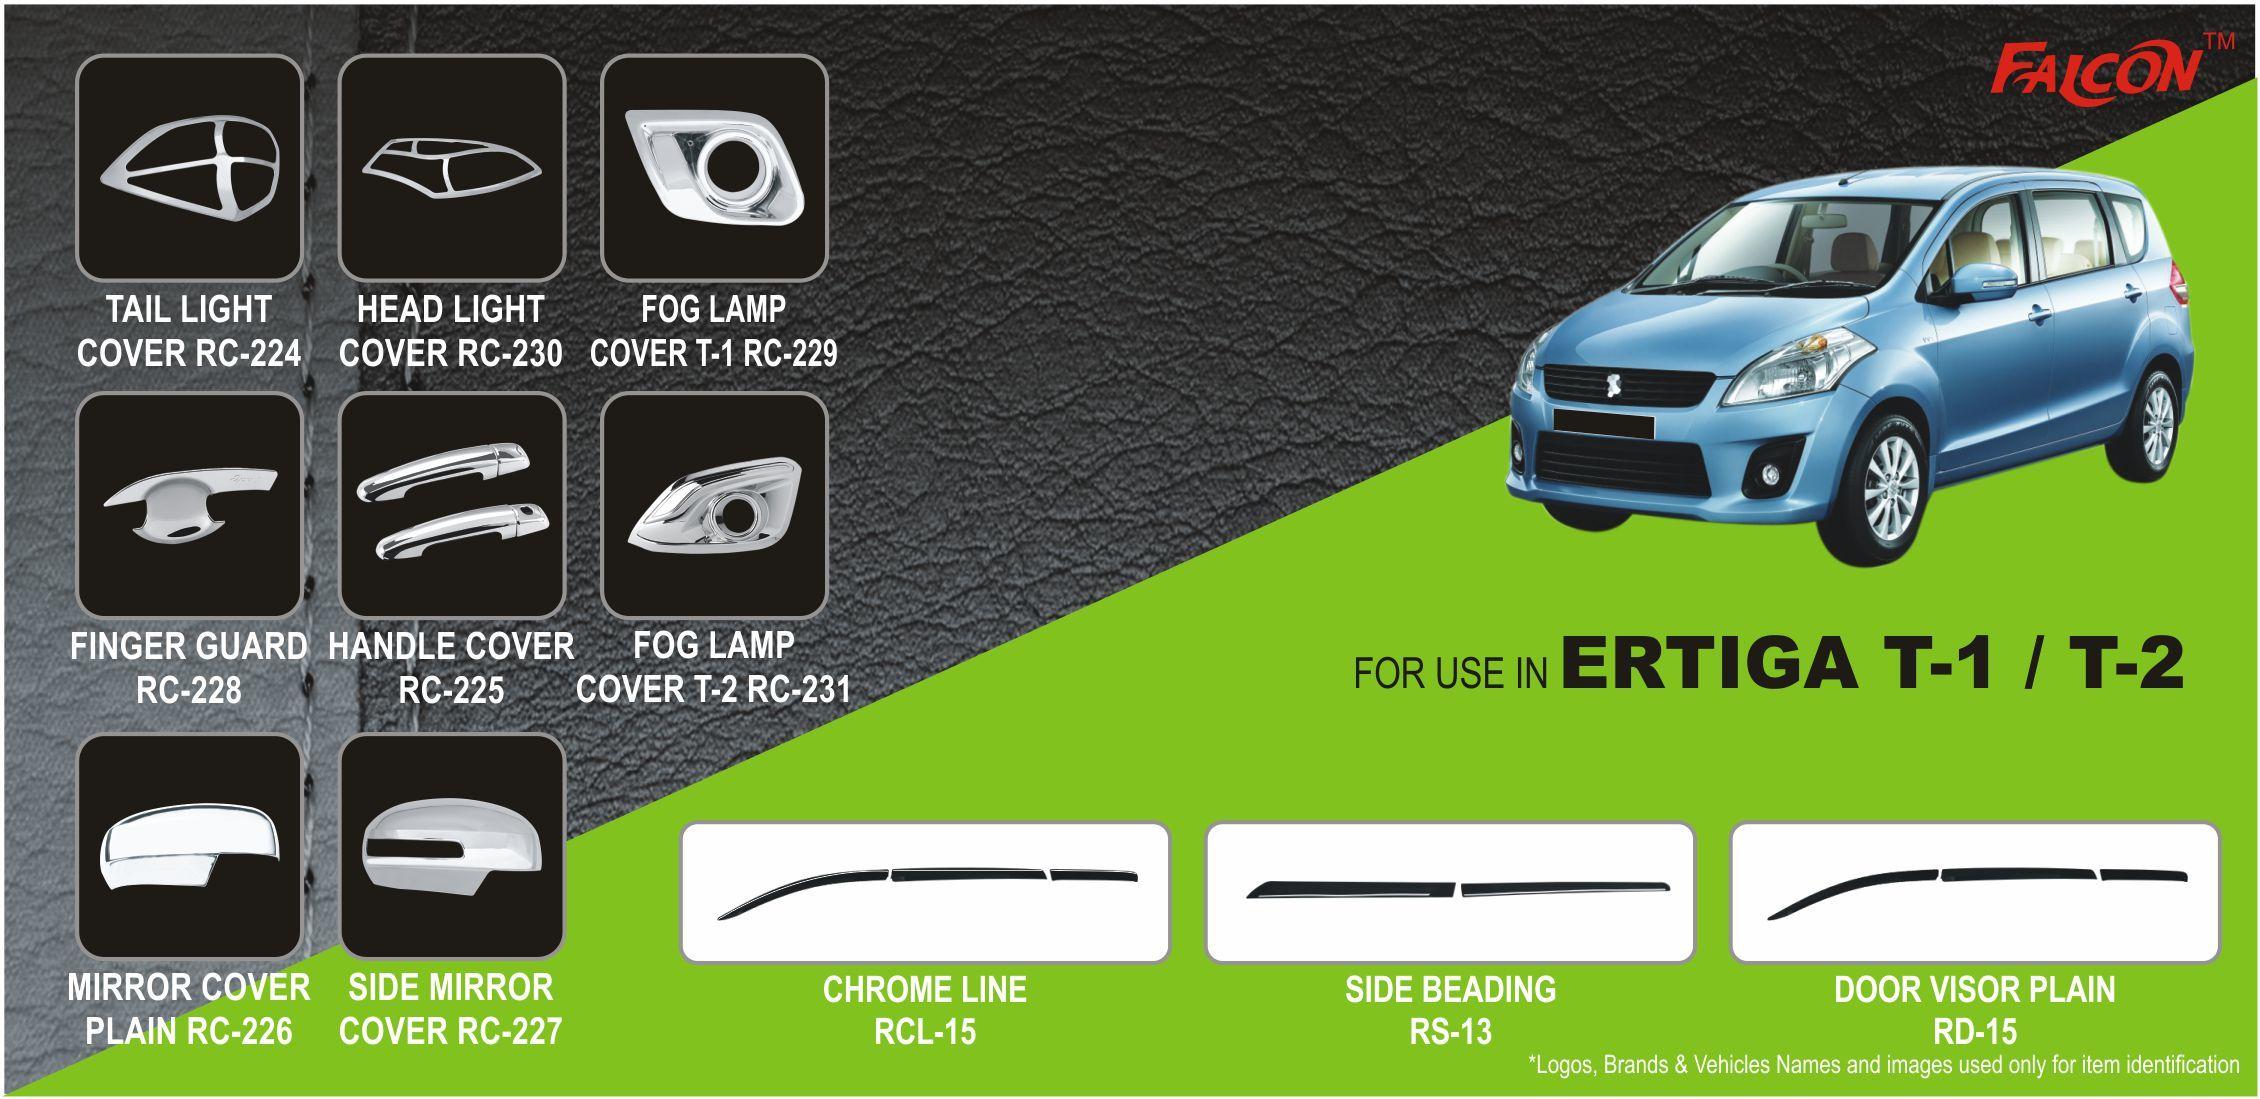 Ertiga 2018 Car Accessories